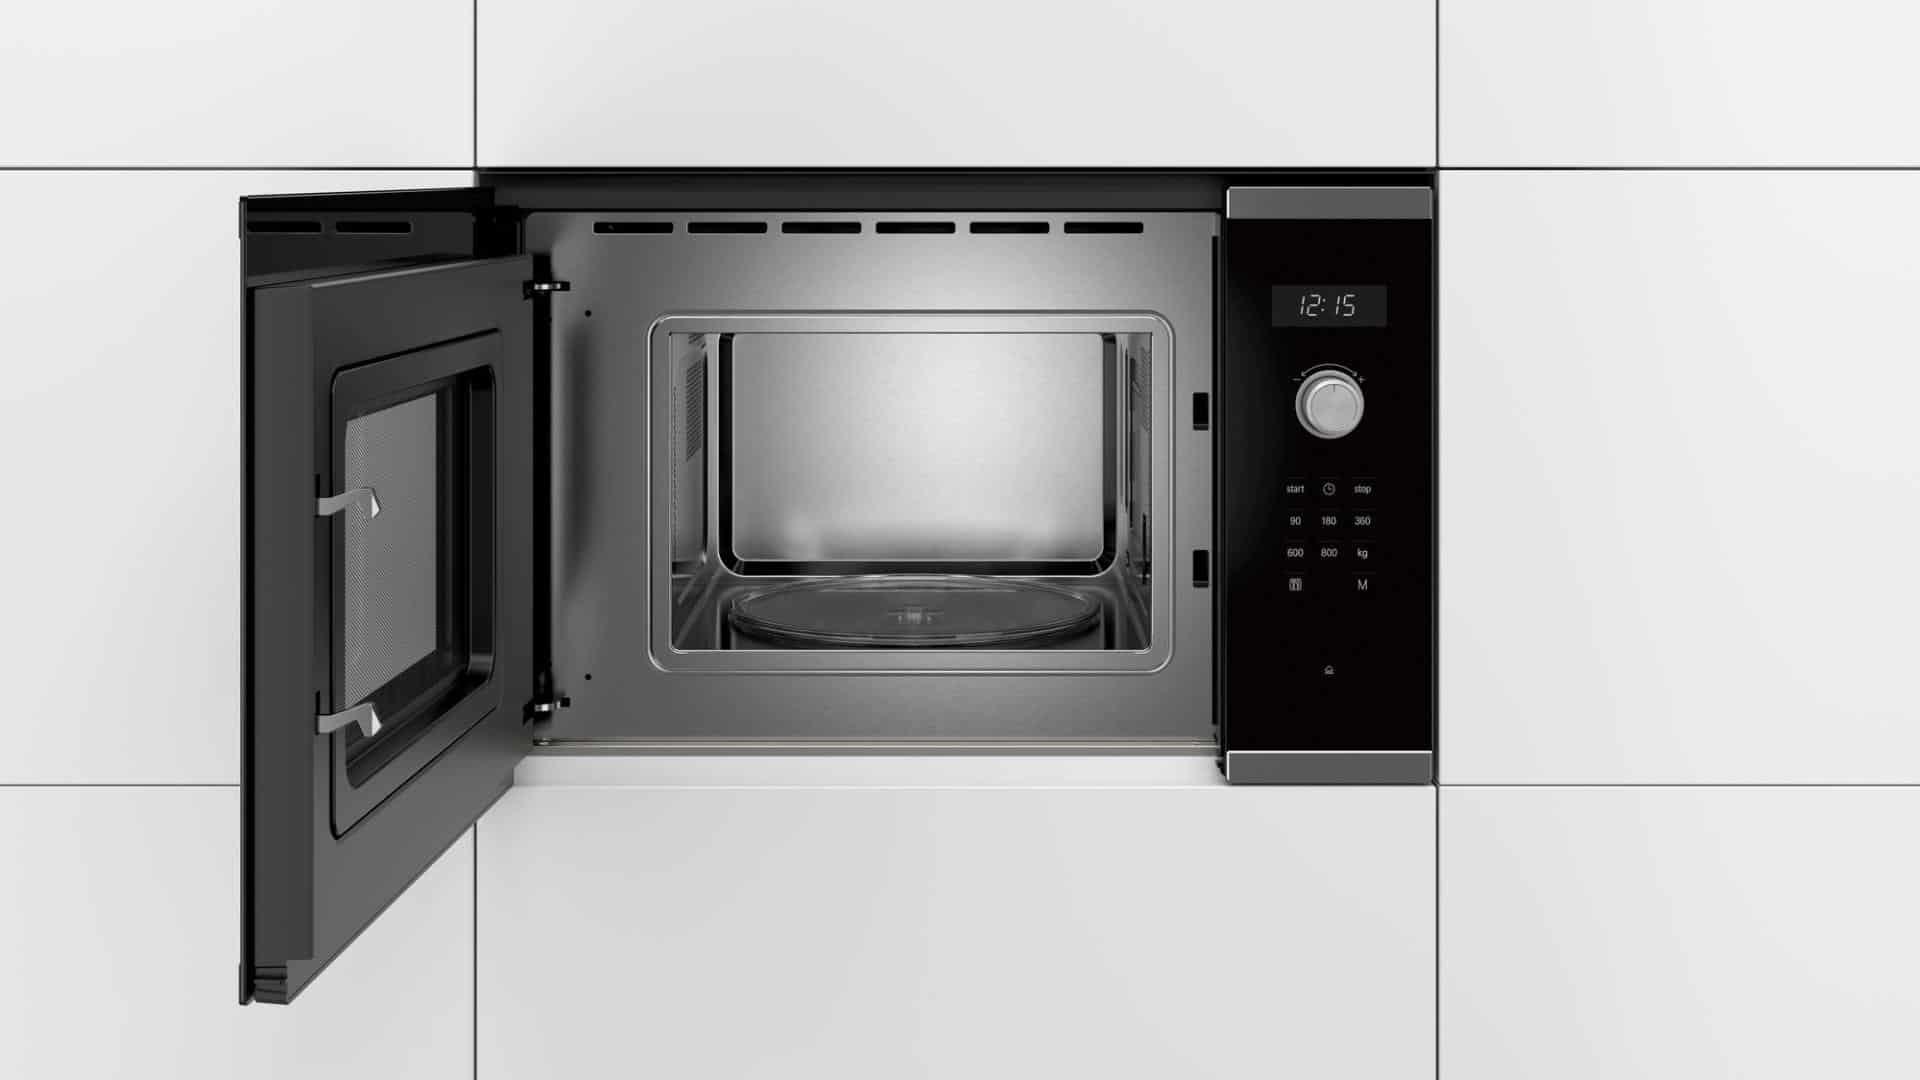 MCSA02767738 BFL524MS0 Microwave Bosch PGA2 def